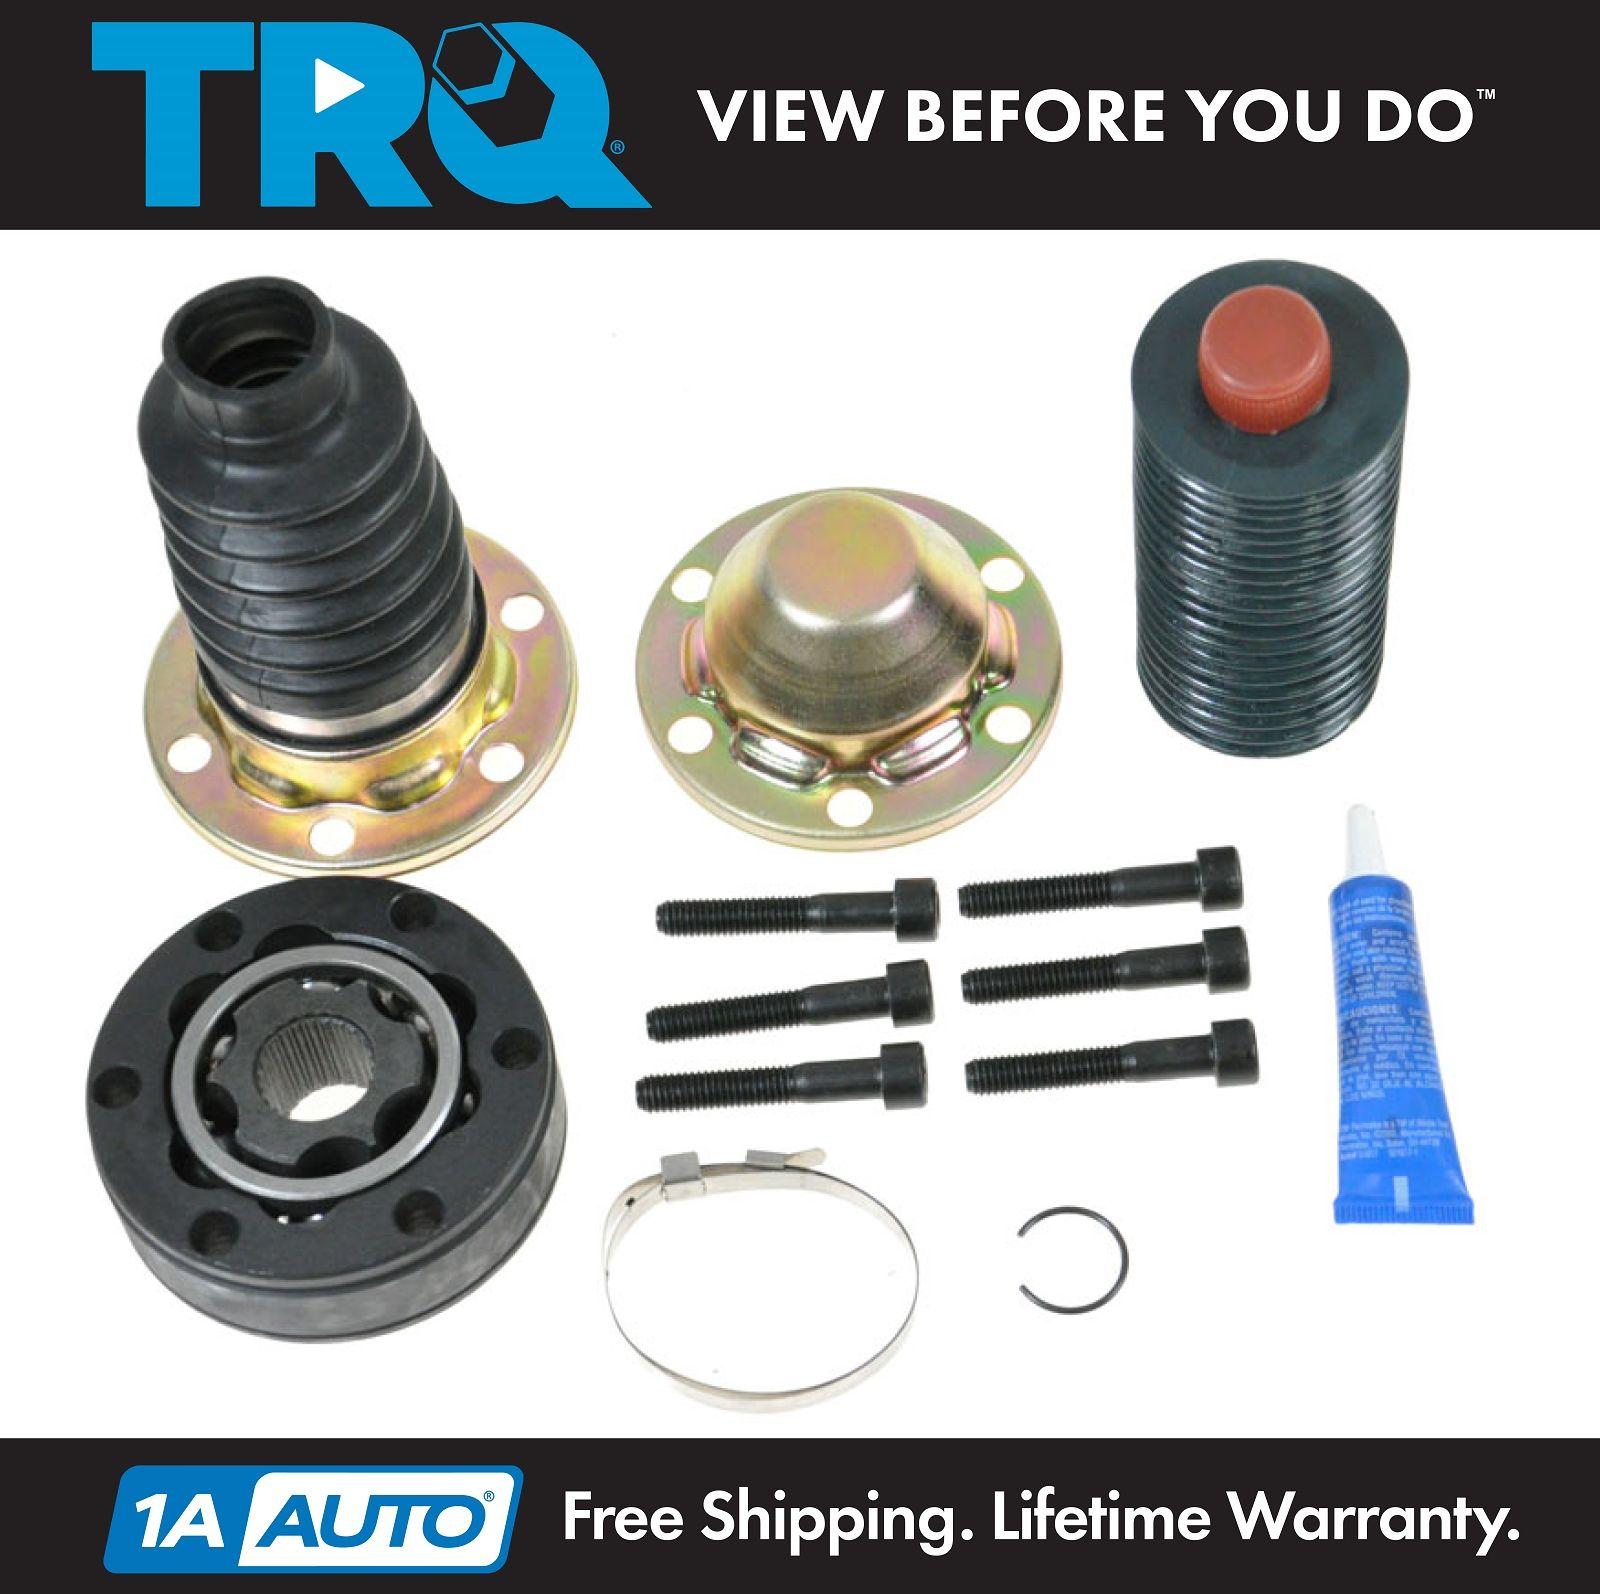 Cv Joint Repair >> Details About Front Driveshaft Rear Cv Joint Rebuild Repair Kit Set For Equinox Torrent Awd